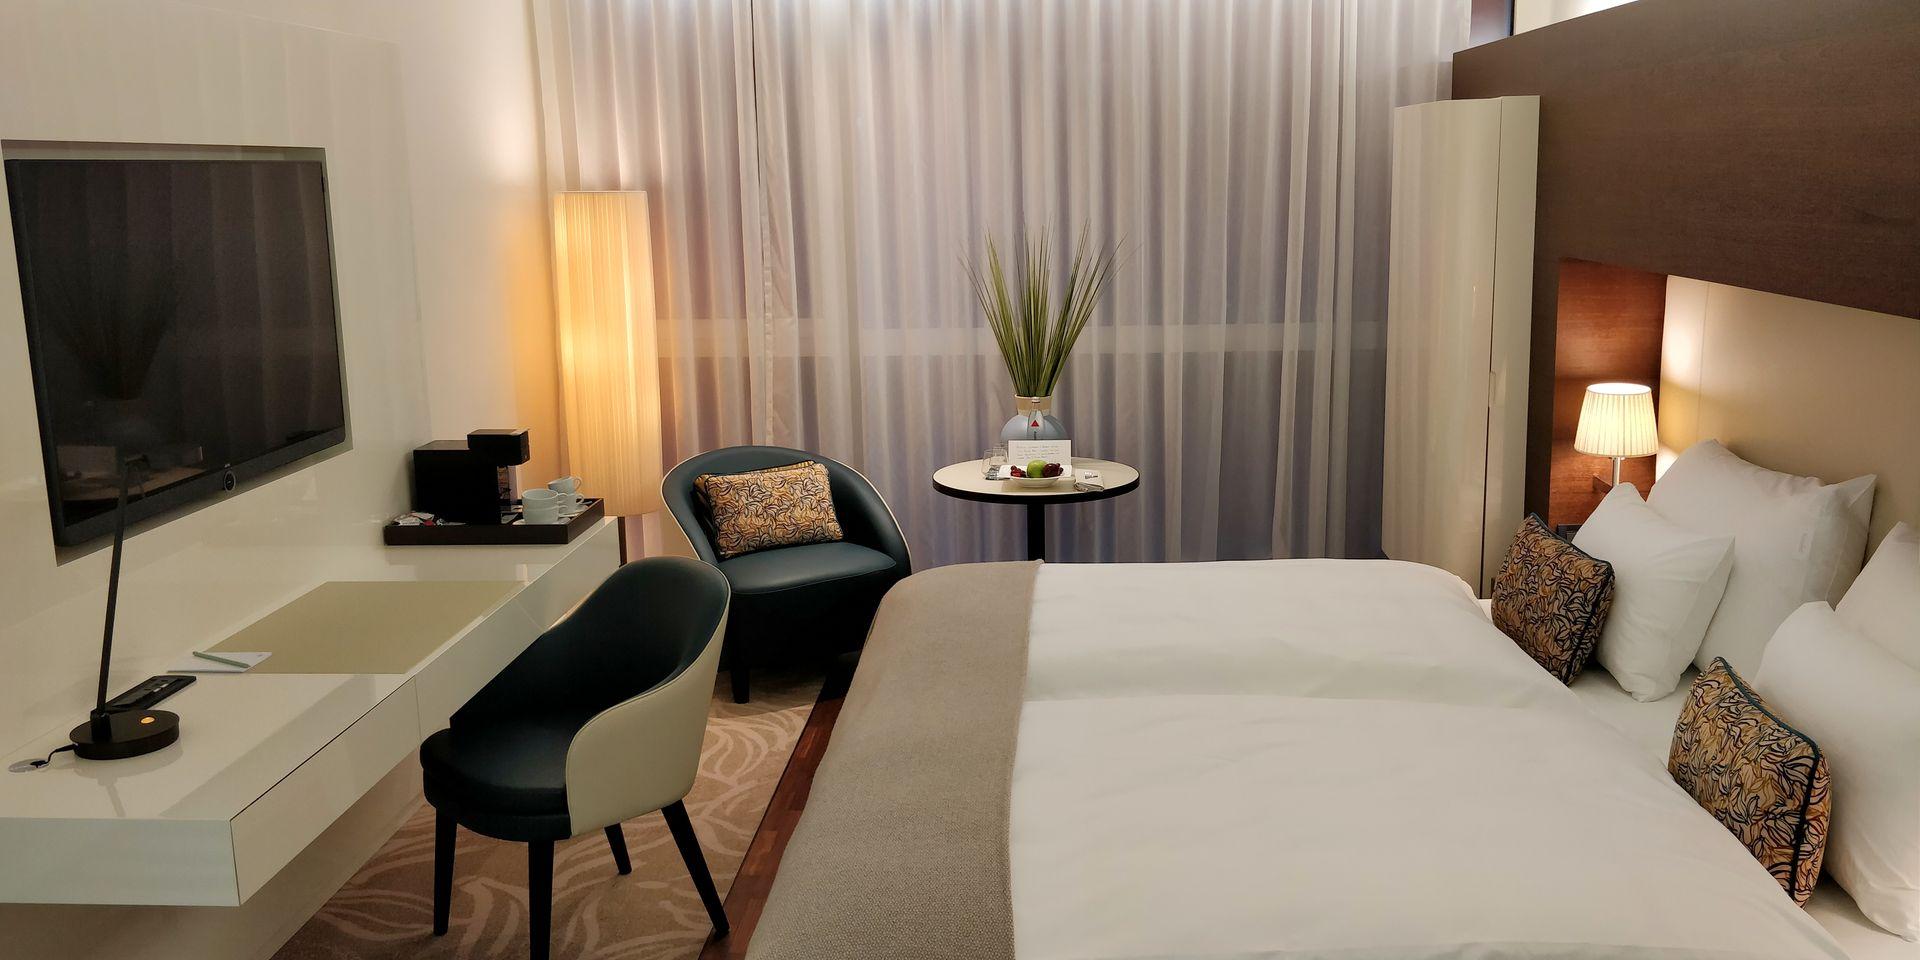 SIDE Hotel Hamburg Room